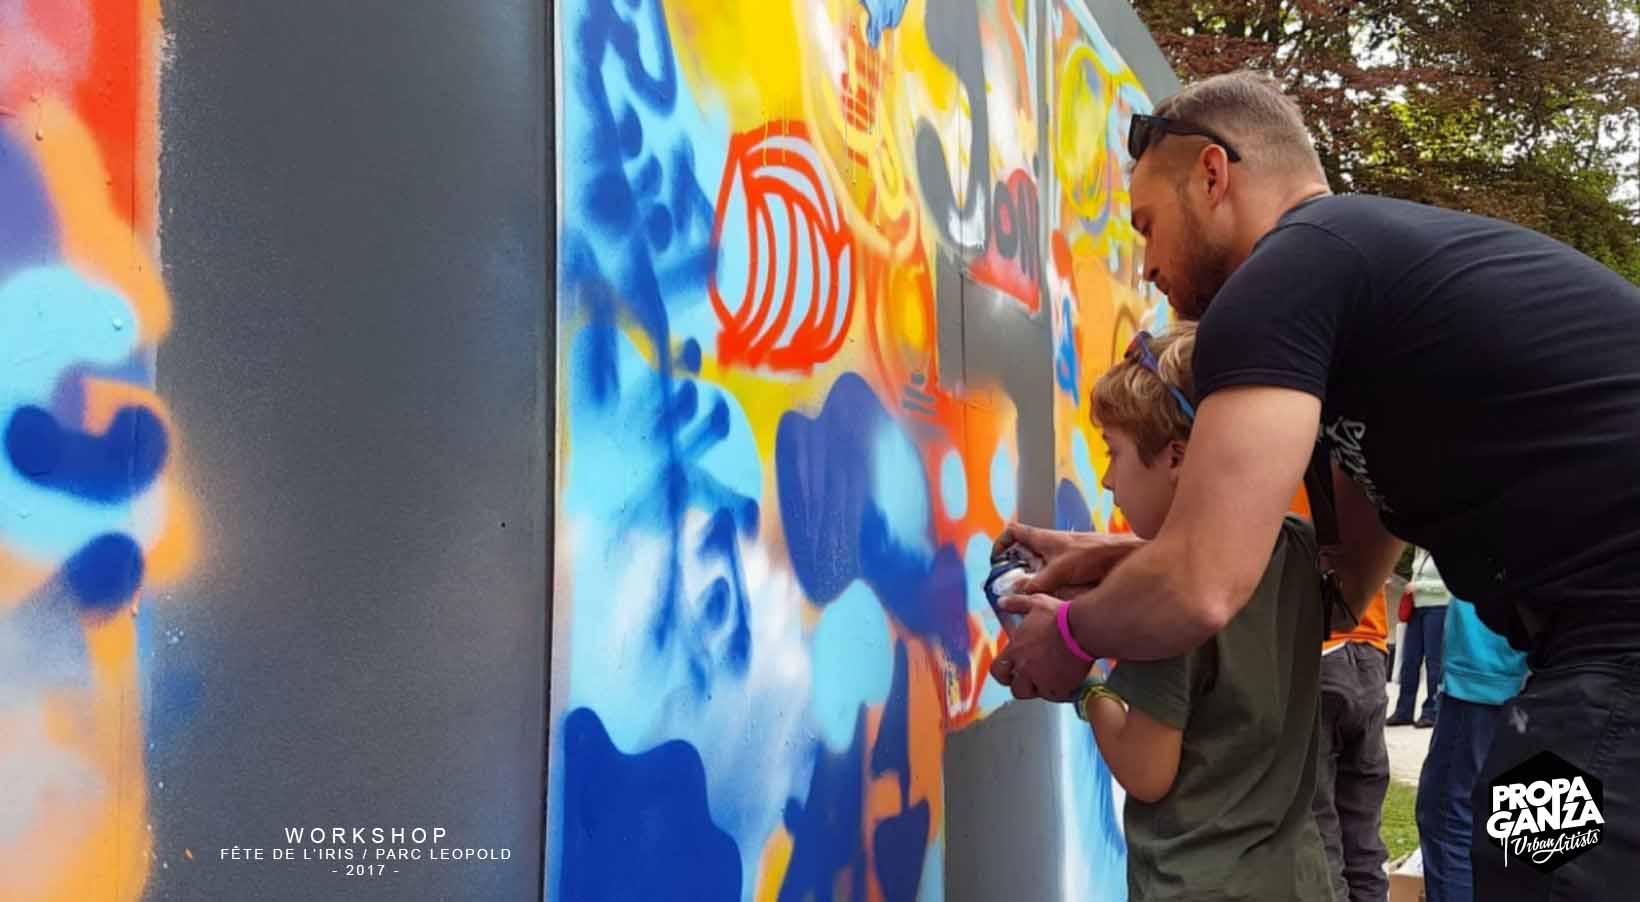 https://www.propaganza.be/wp-content/uploads/2019/04/Propaganza-graffiti-workshop-iris-leopold-parc-bruxelles-brussels-street-art-event-2017-fresque-participative.jpg